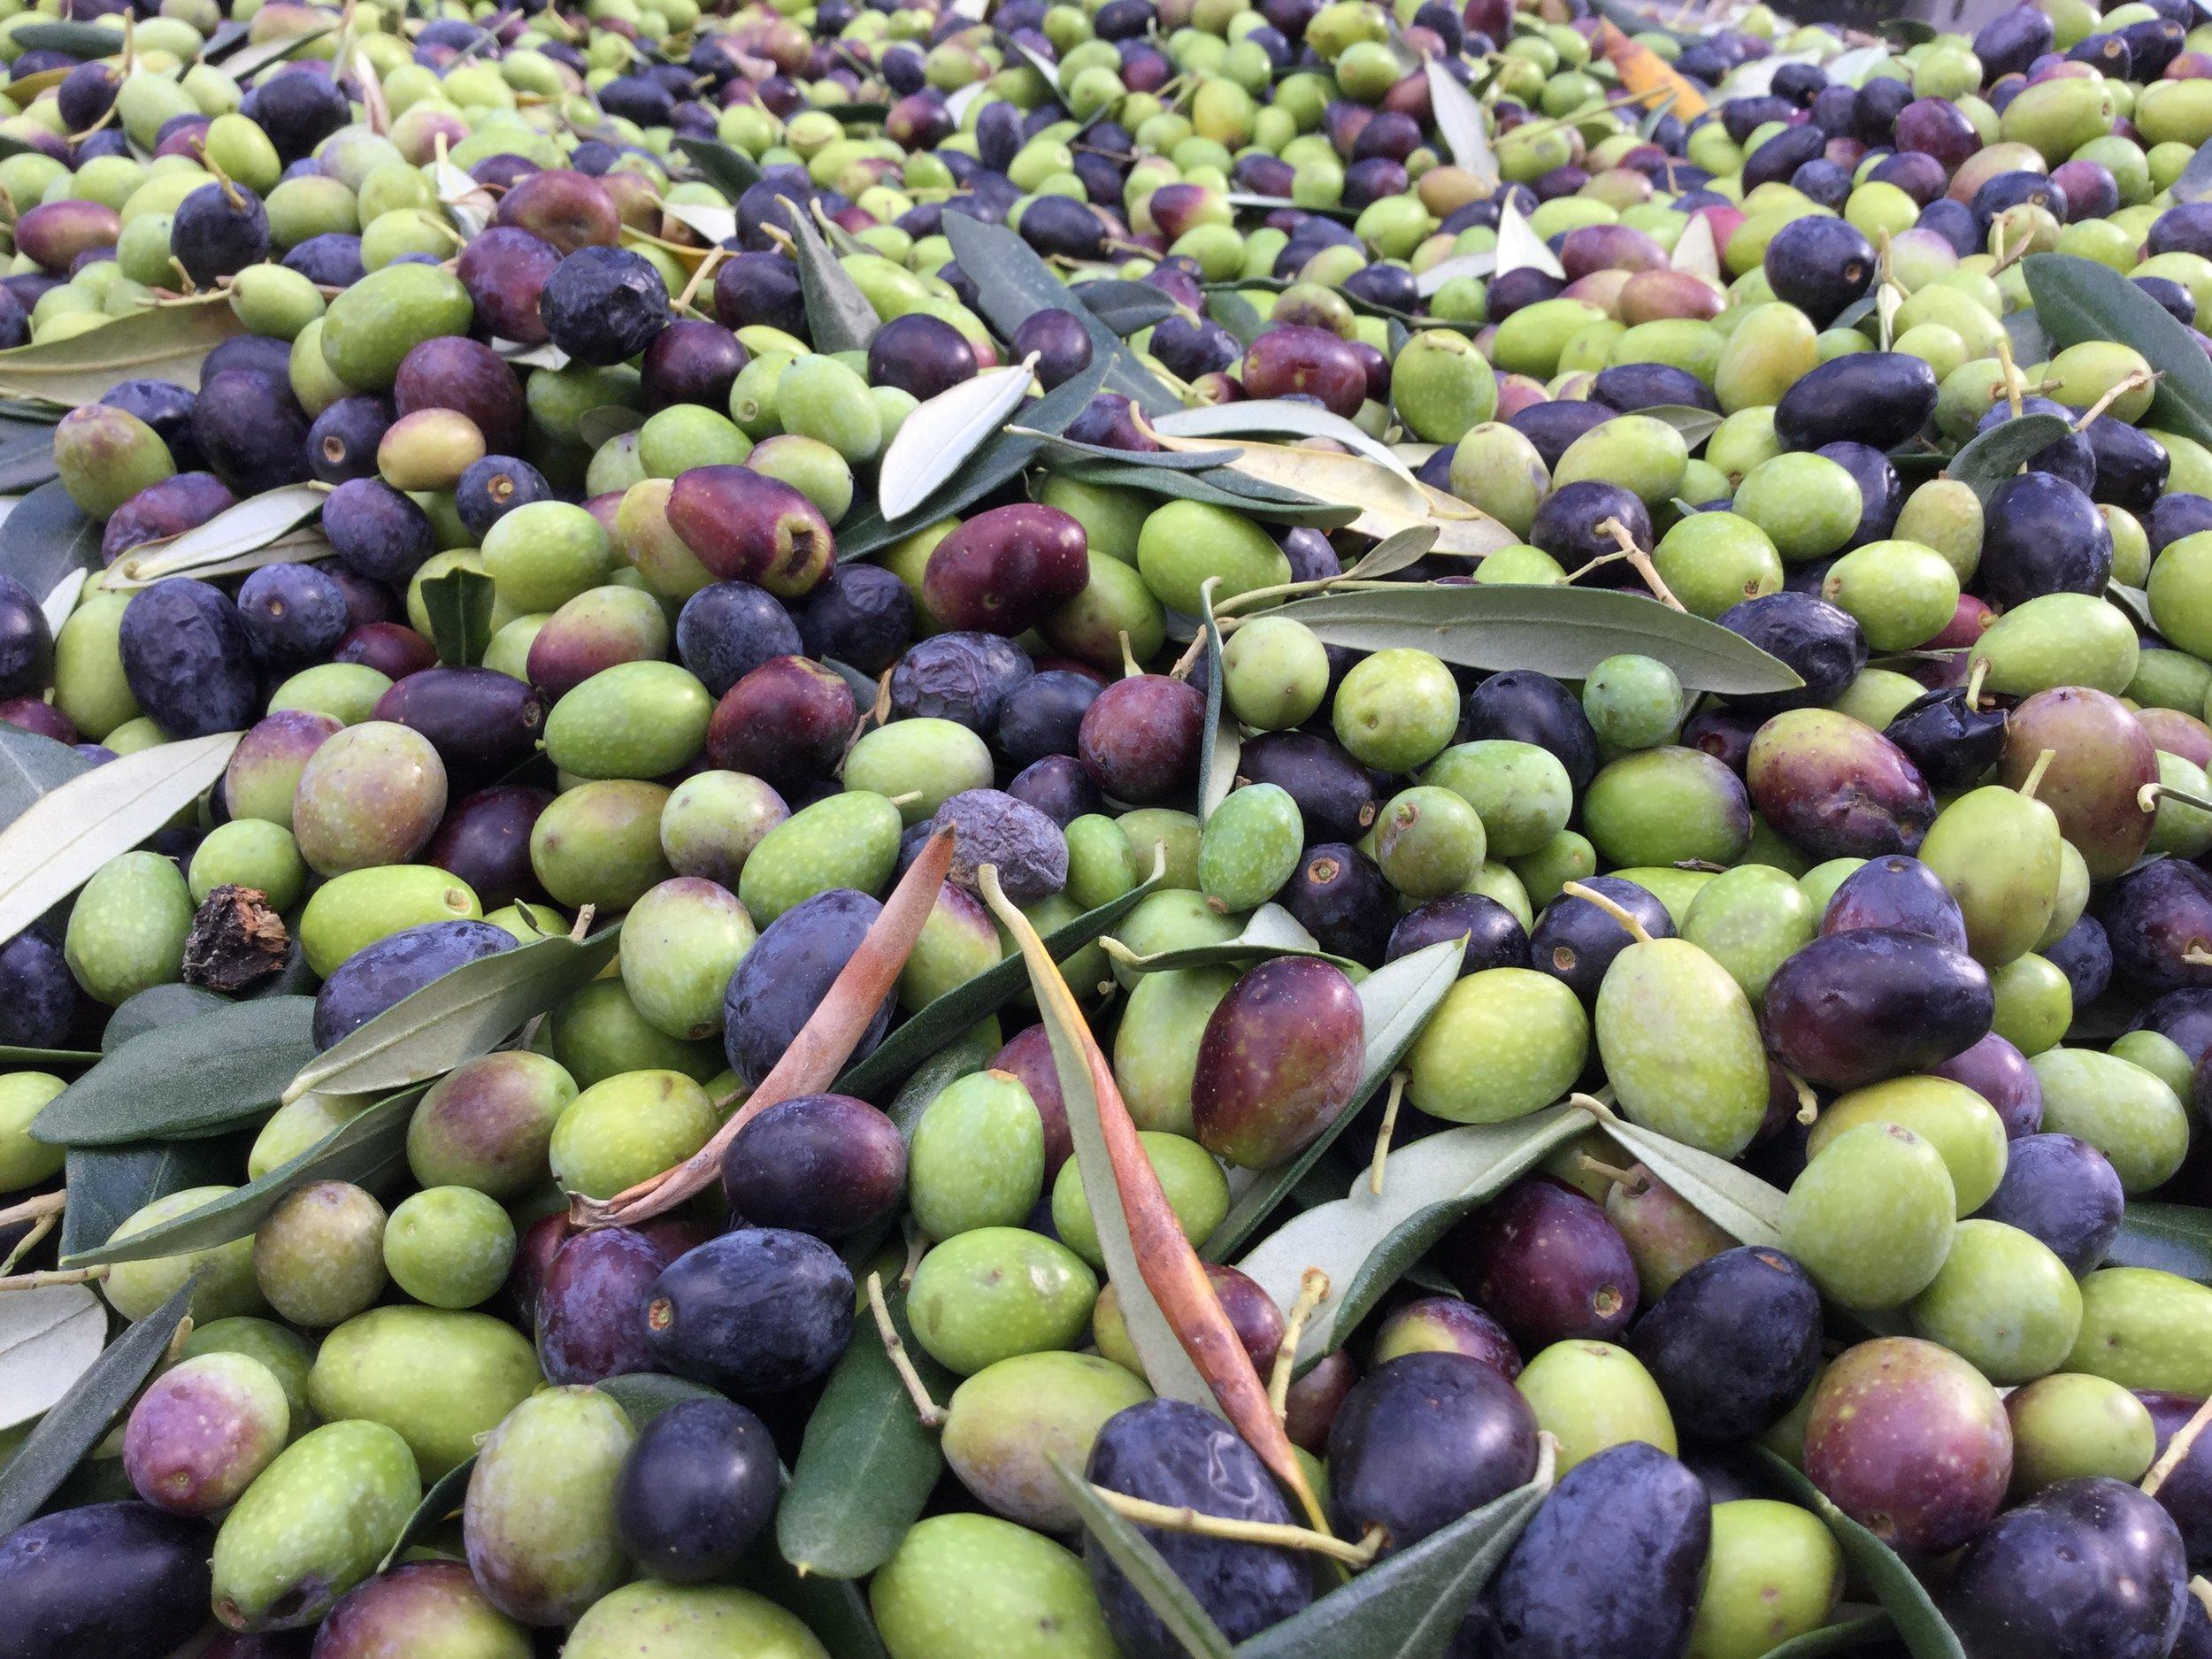 olives-just-picked_24690676388_o.jpg